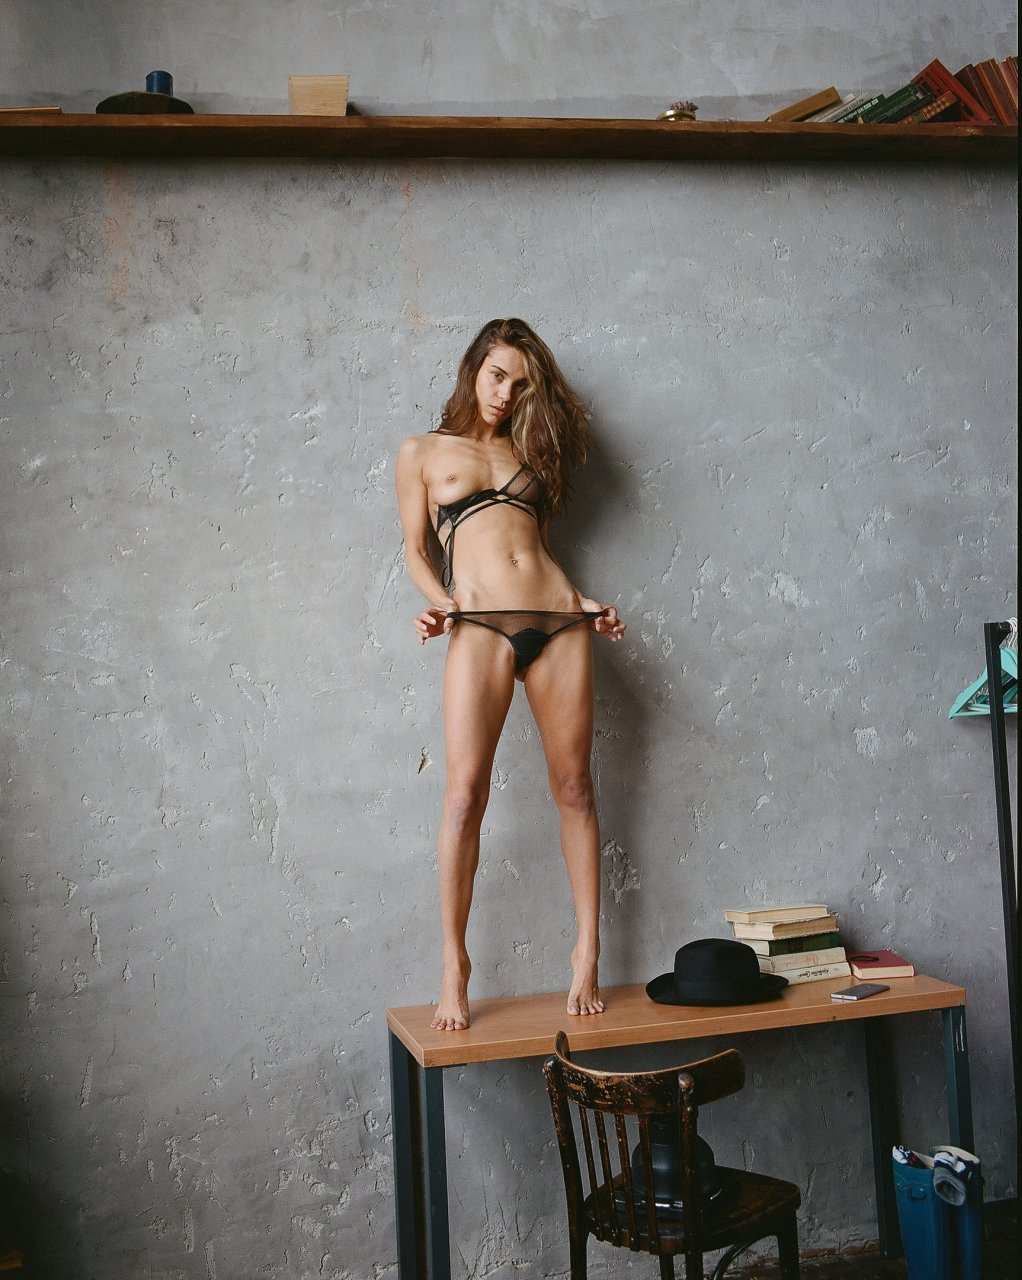 Nude Katerina Klein nude photos 2019